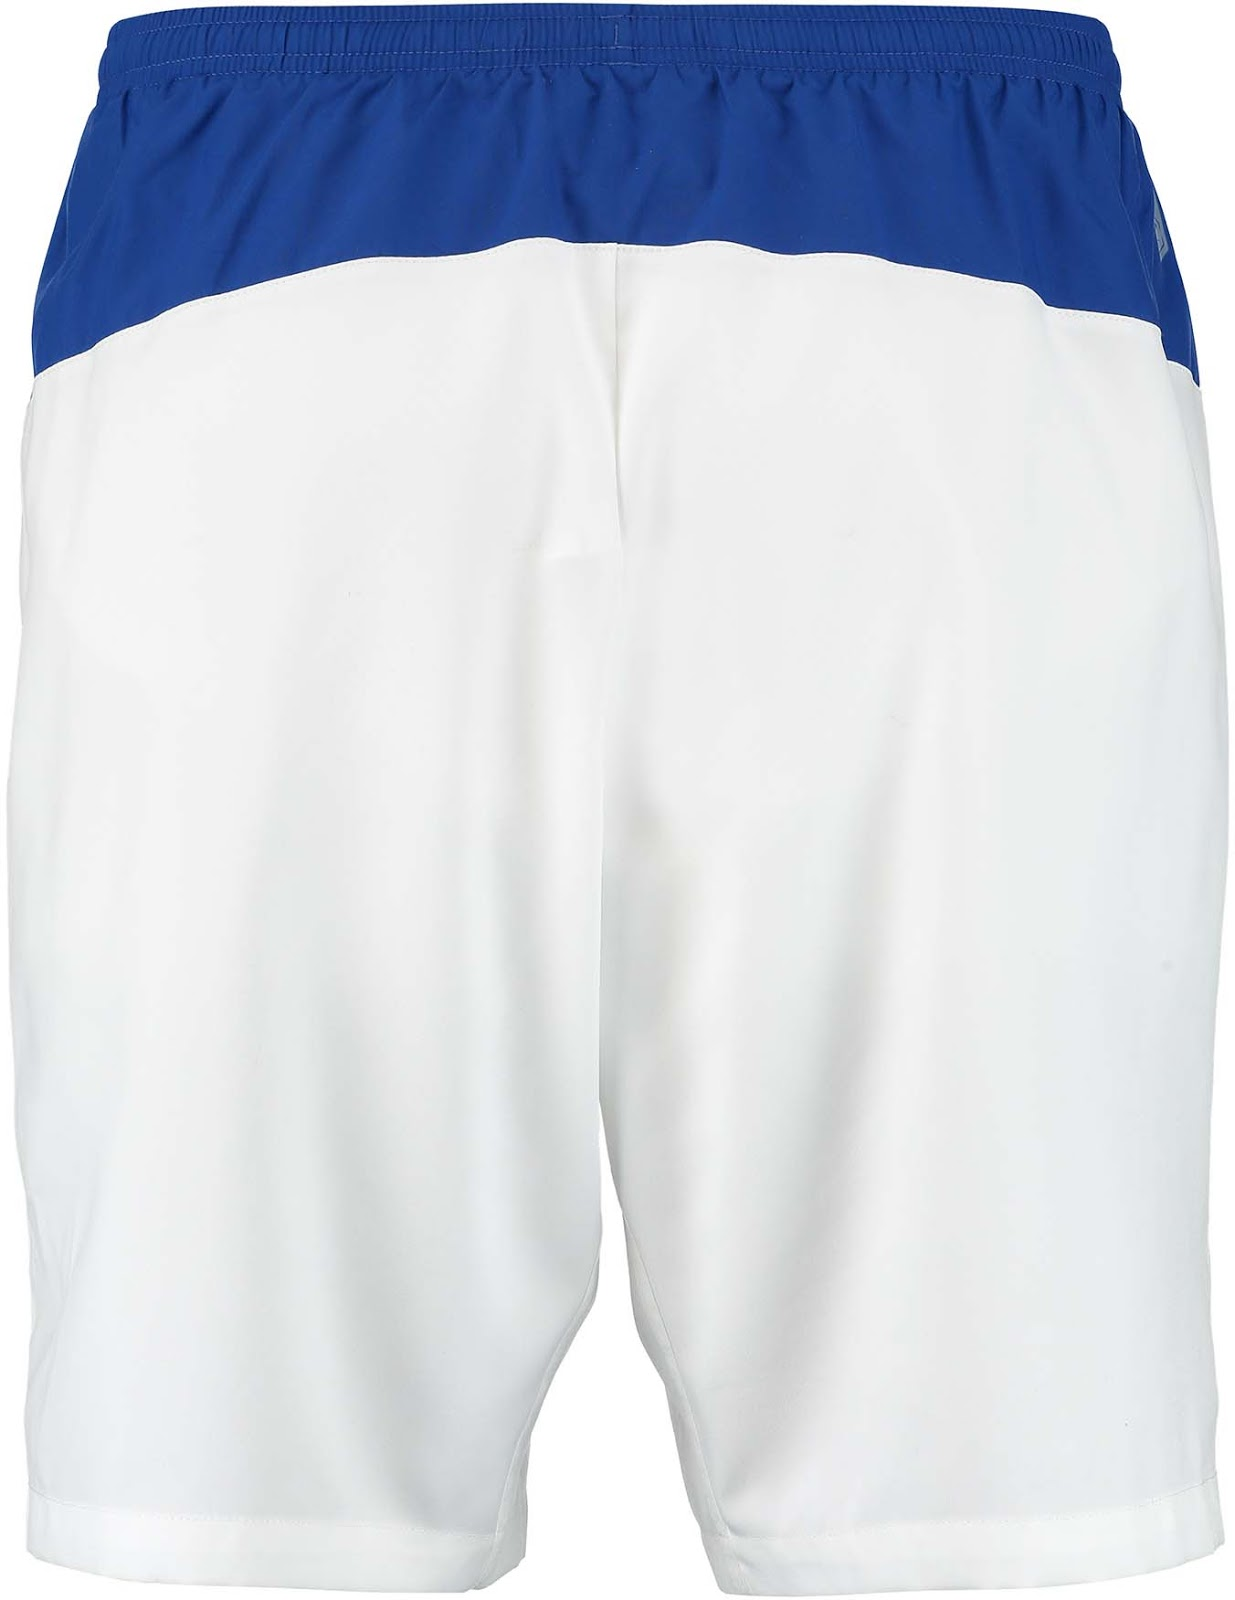 1d27a5b64 Everton 15-16 Released - Sports kicks